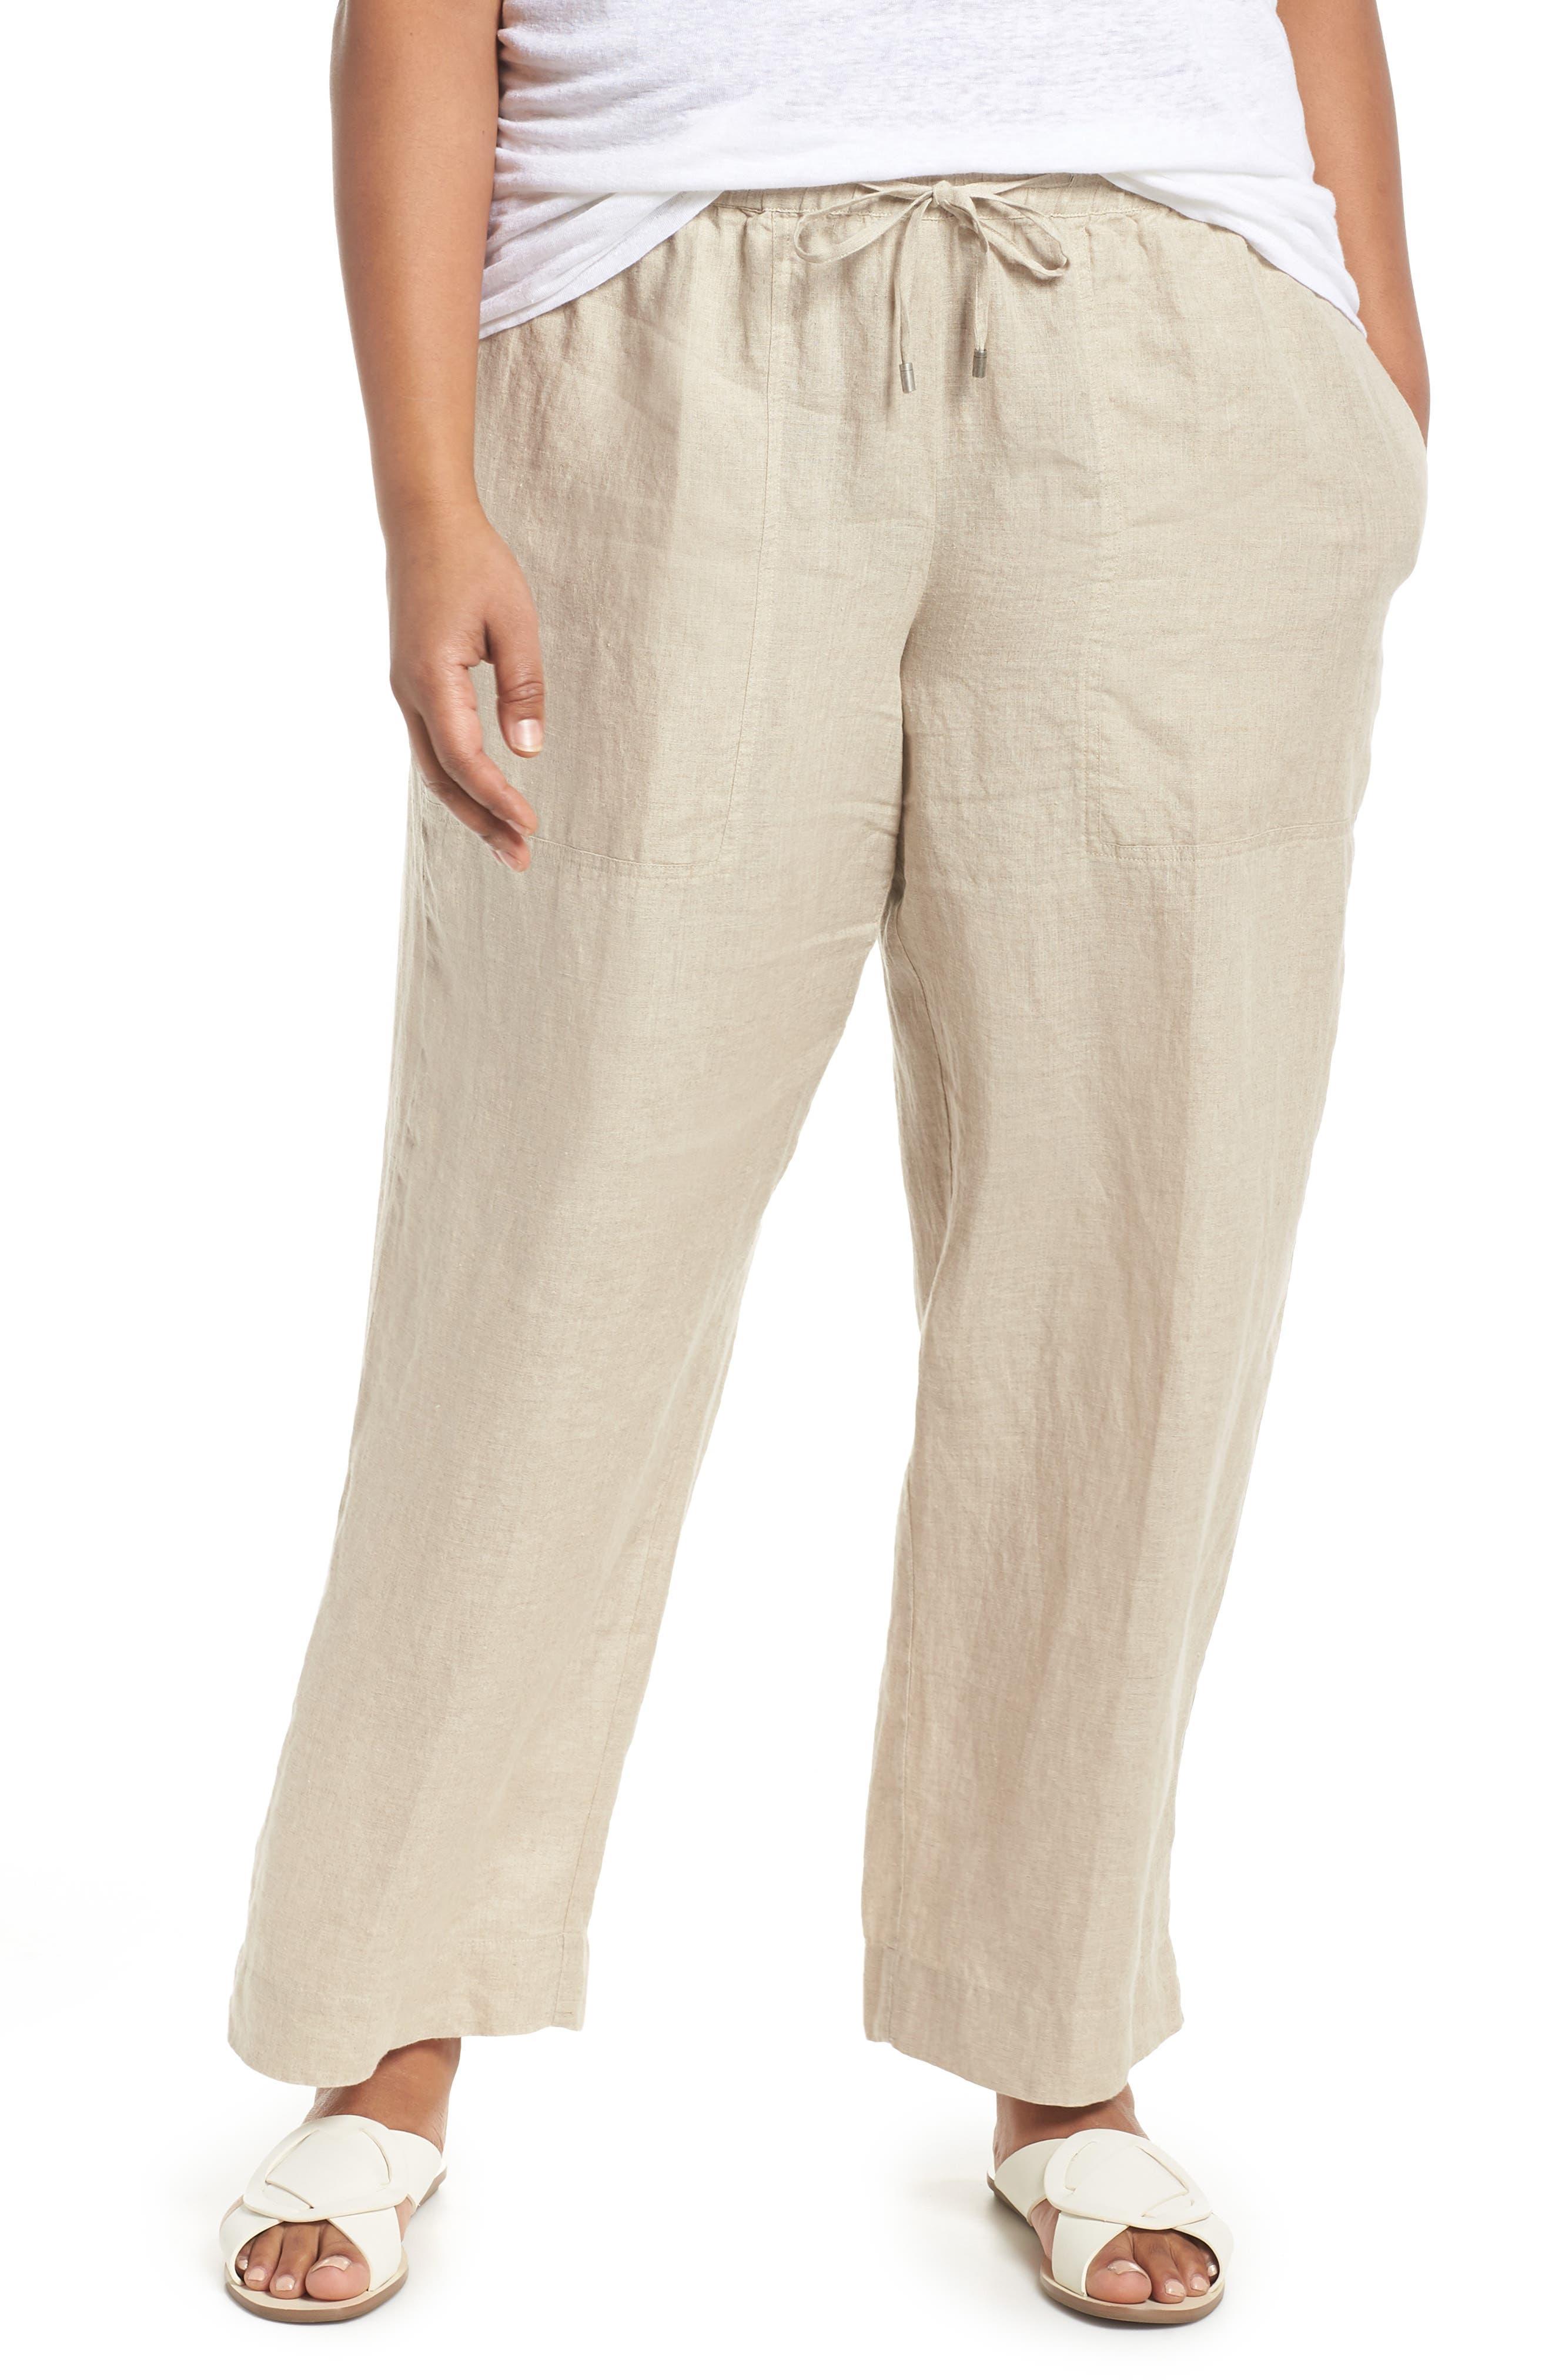 Organic Linen Ankle Pants,                             Main thumbnail 1, color,                             Undyed Natural